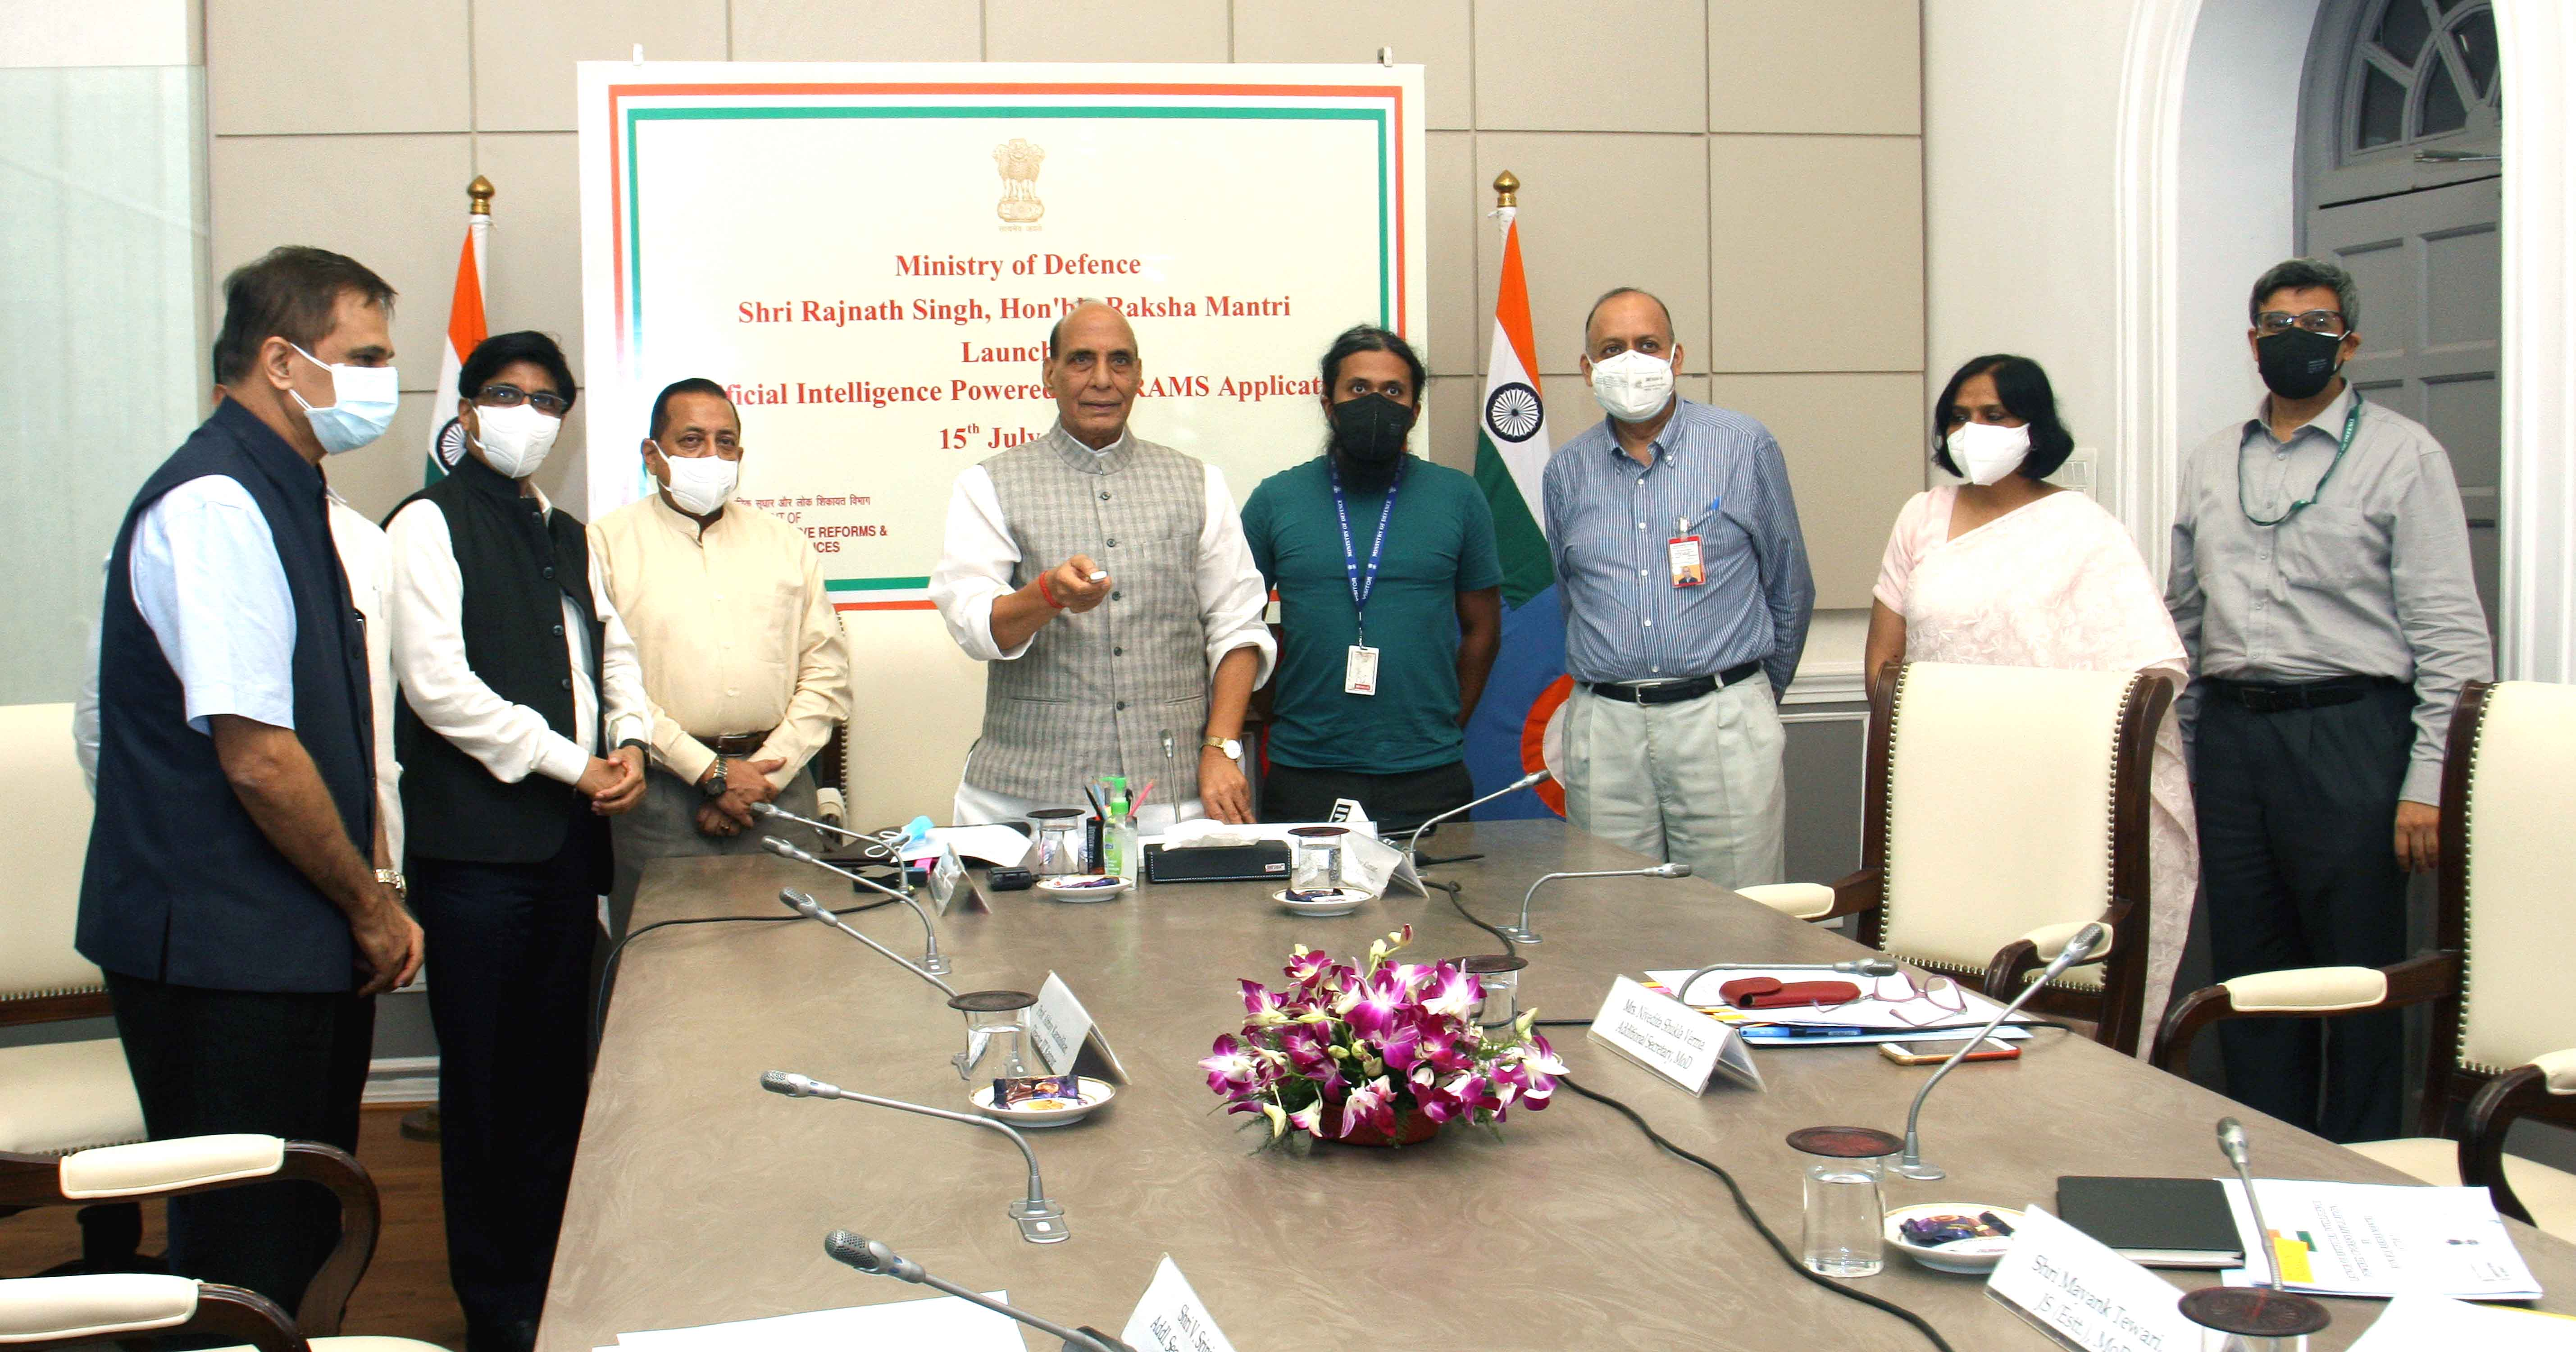 Raksha Mantri launches Artificial Intelligence powered grievance management application;